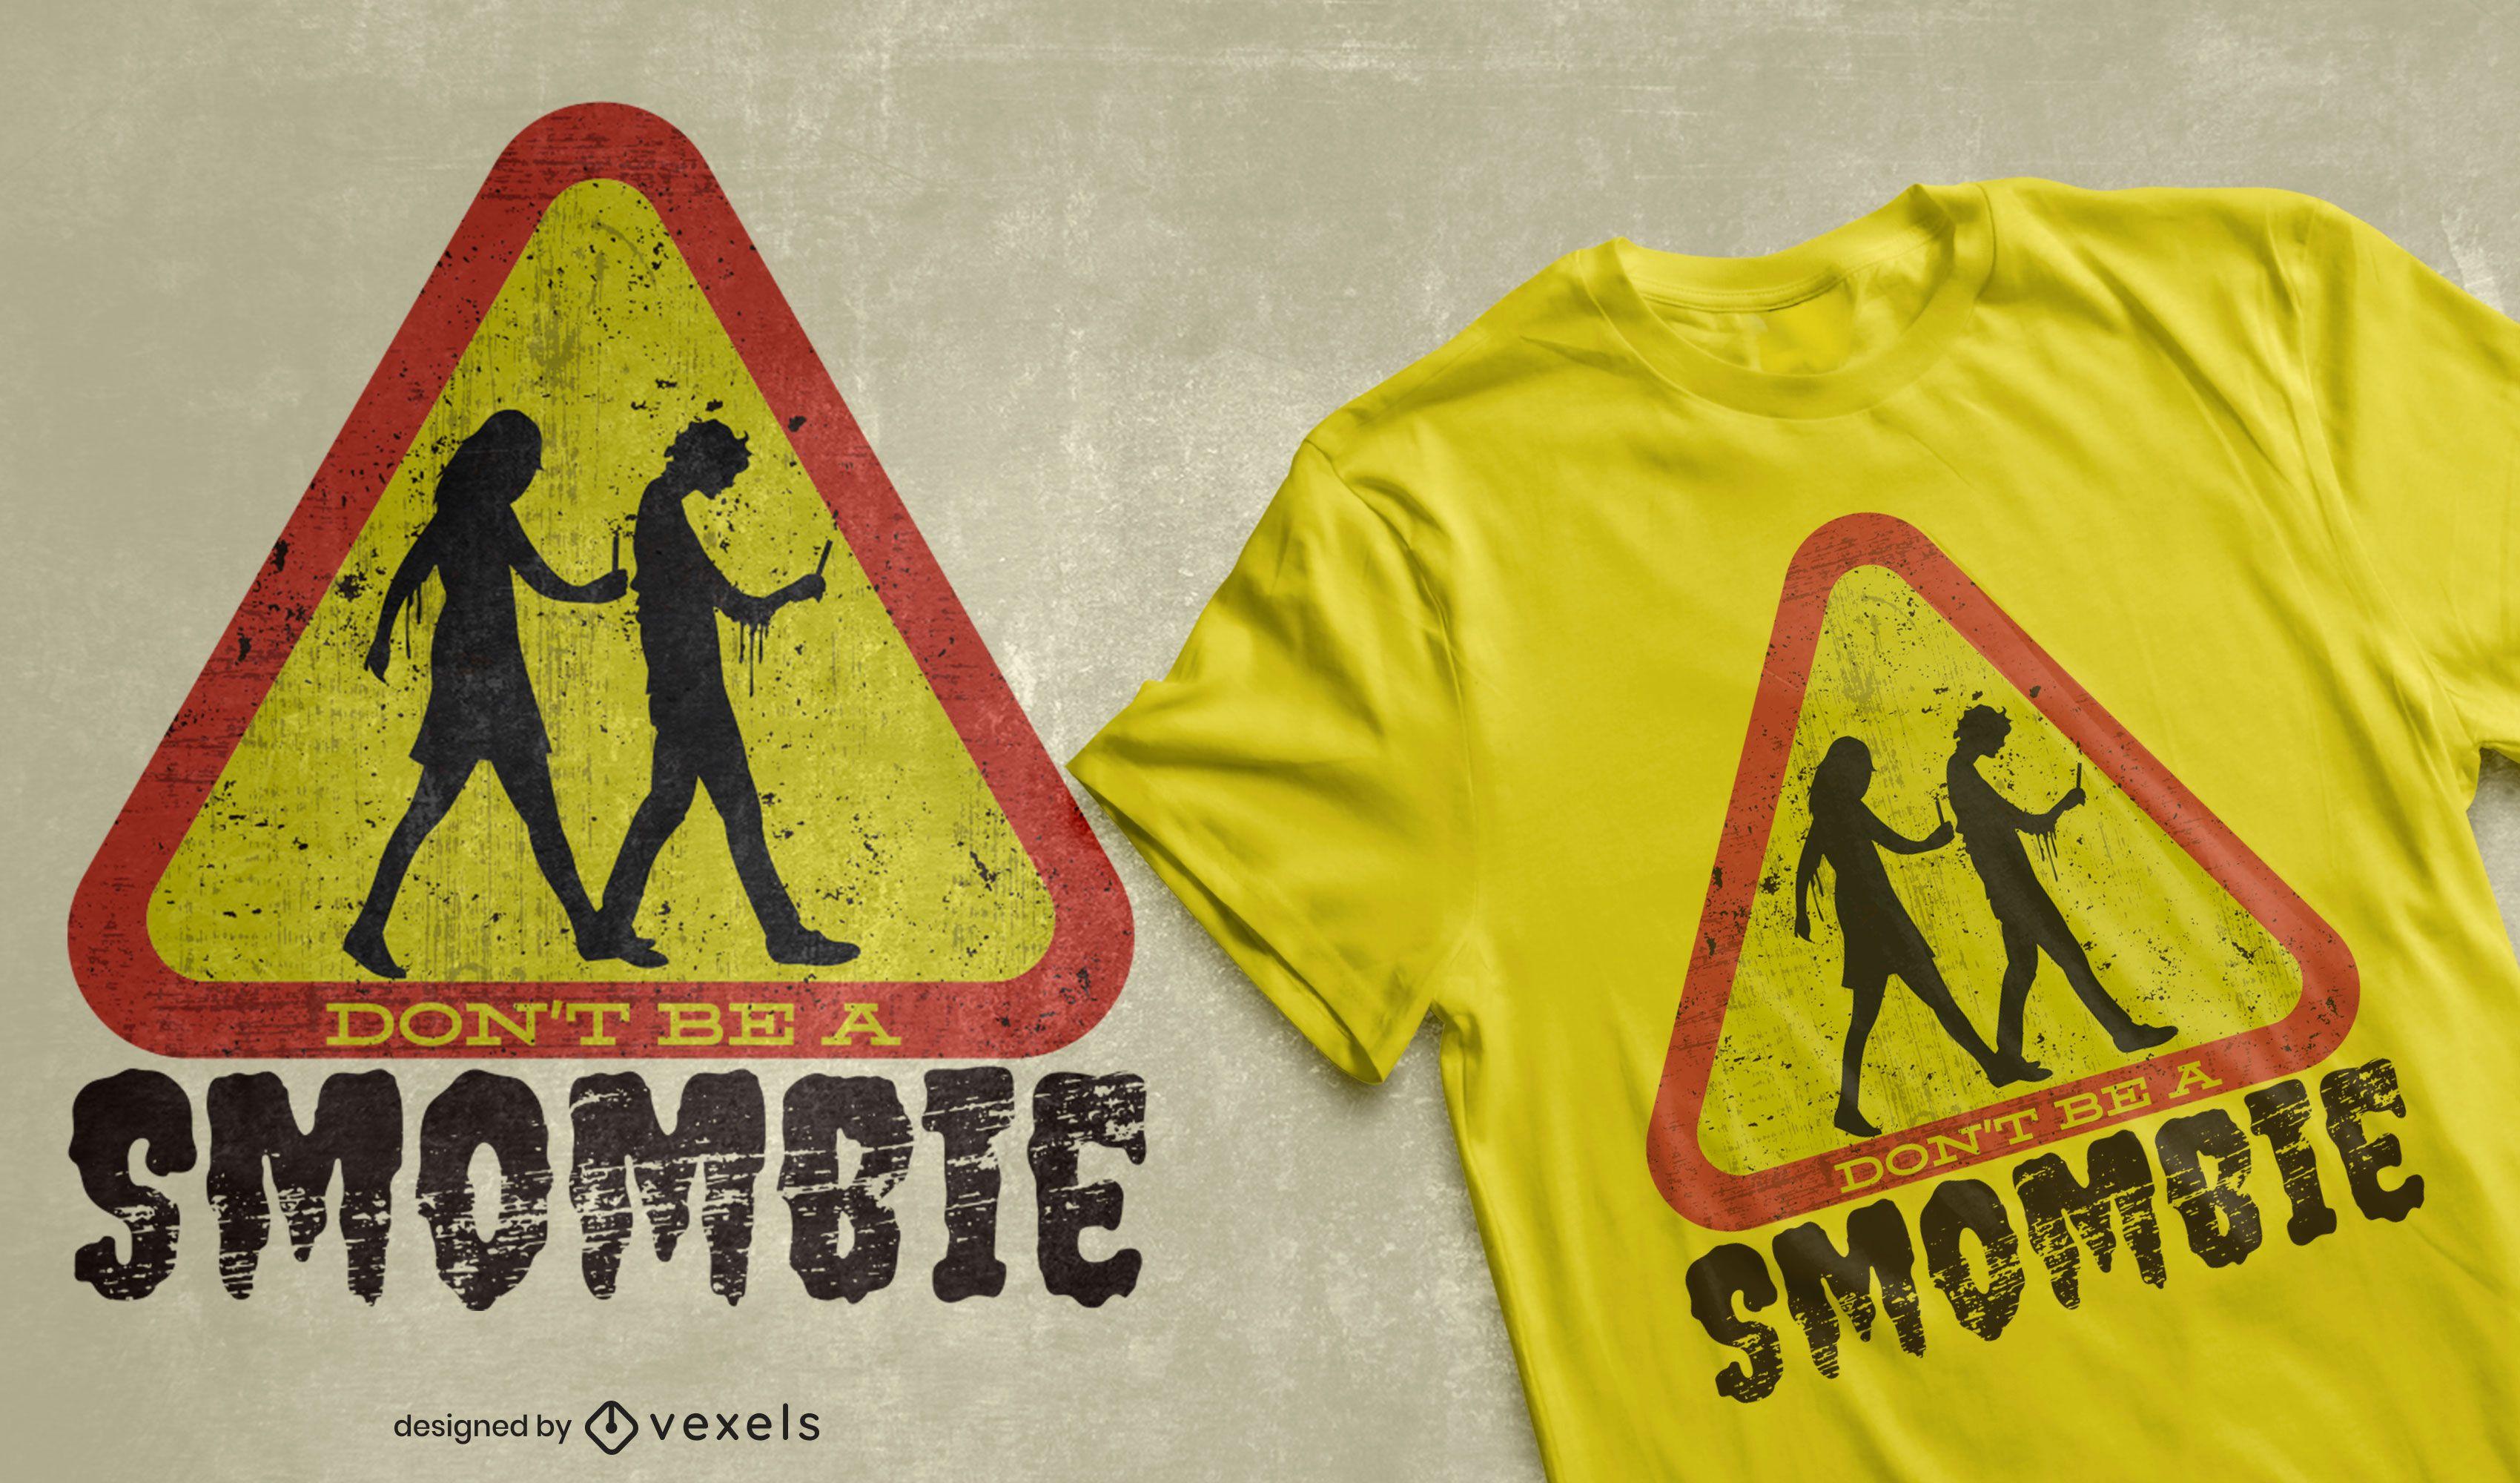 Dise?o de camiseta de letrero de calle zombie de tel?fono m?vil